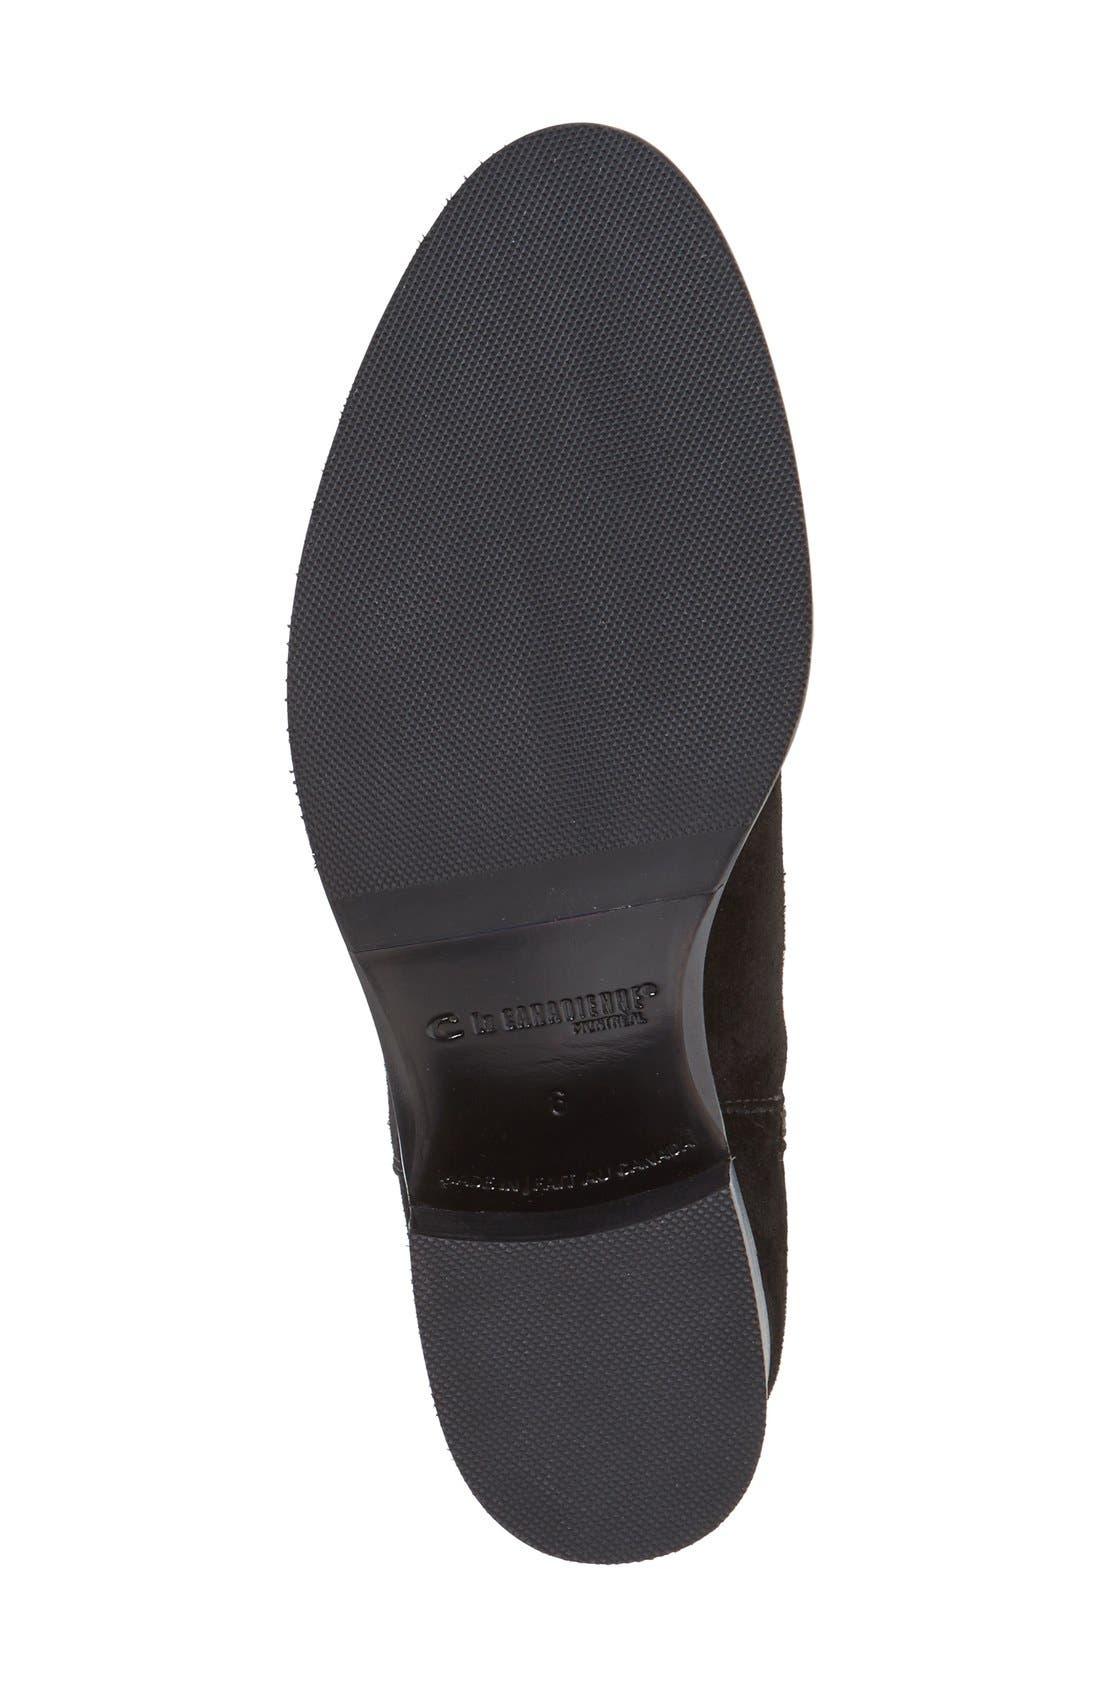 'Polly' Waterproof Knee High Boot,                             Alternate thumbnail 4, color,                             BLACK SUEDE